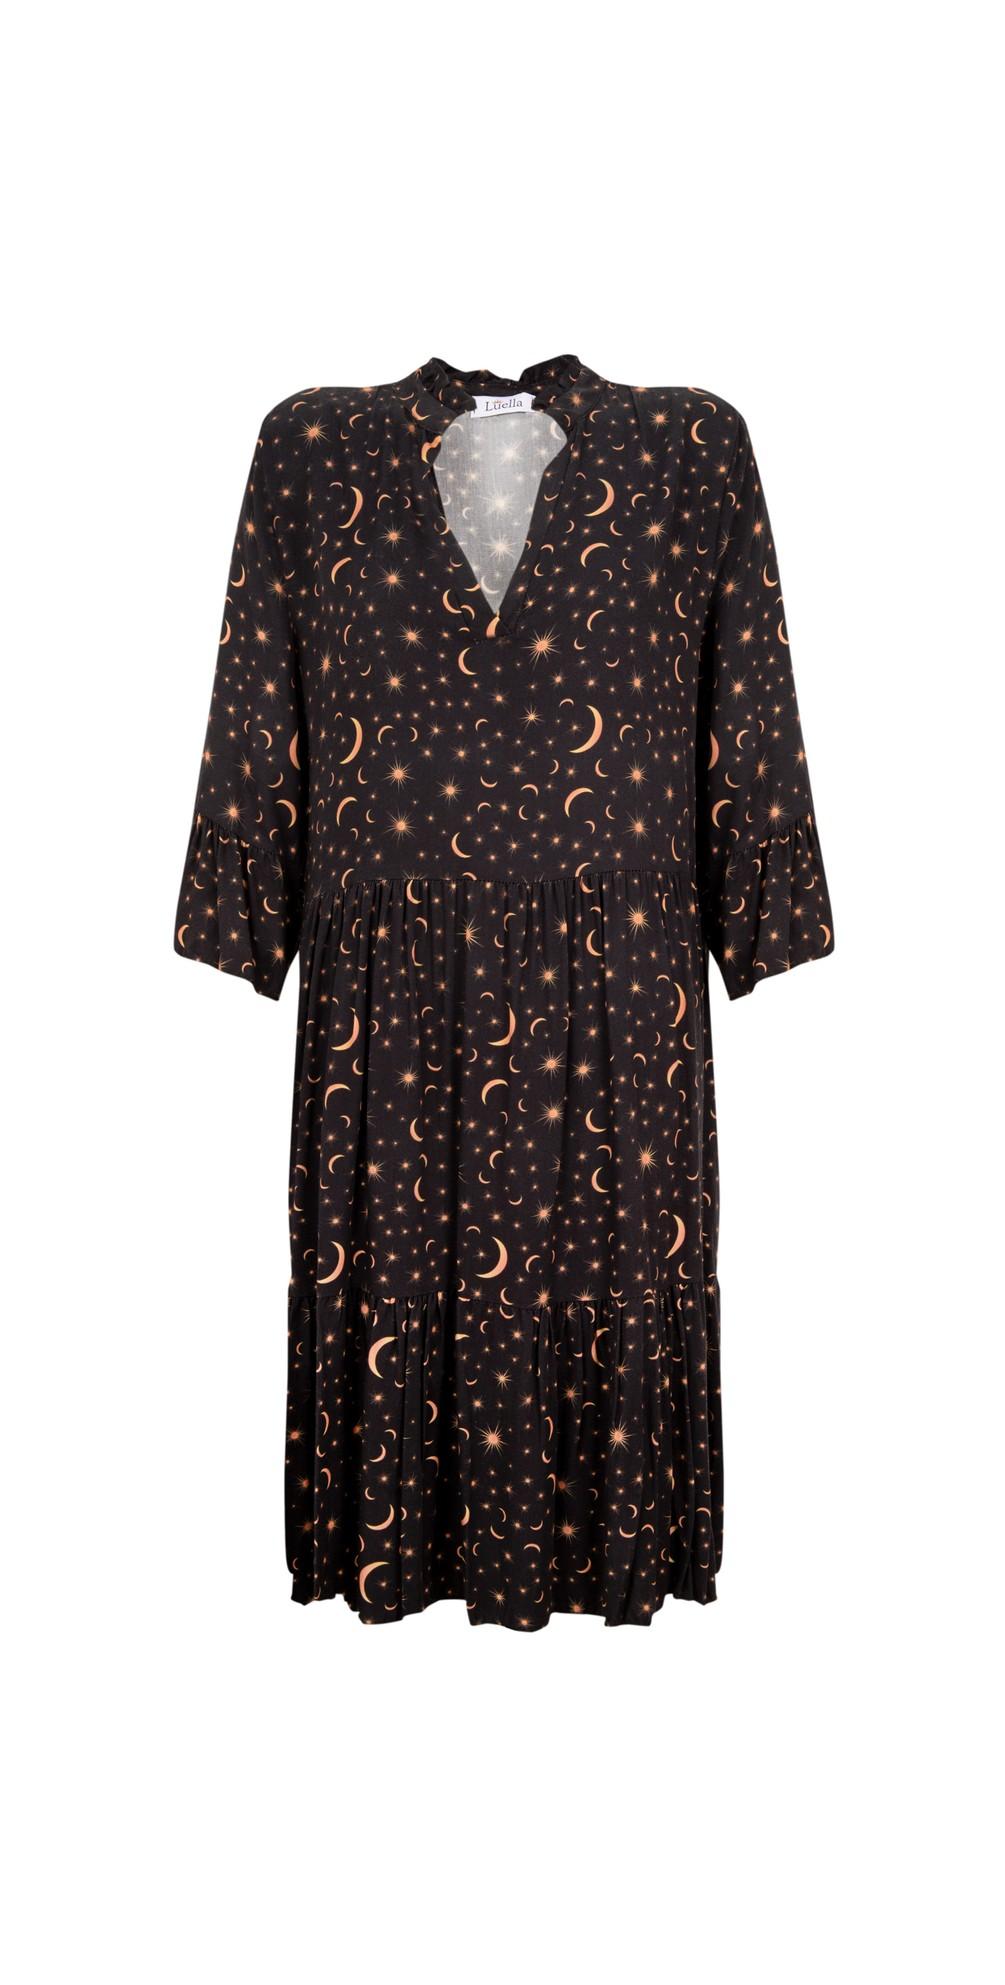 Celeste Moon & Star Dress  main image